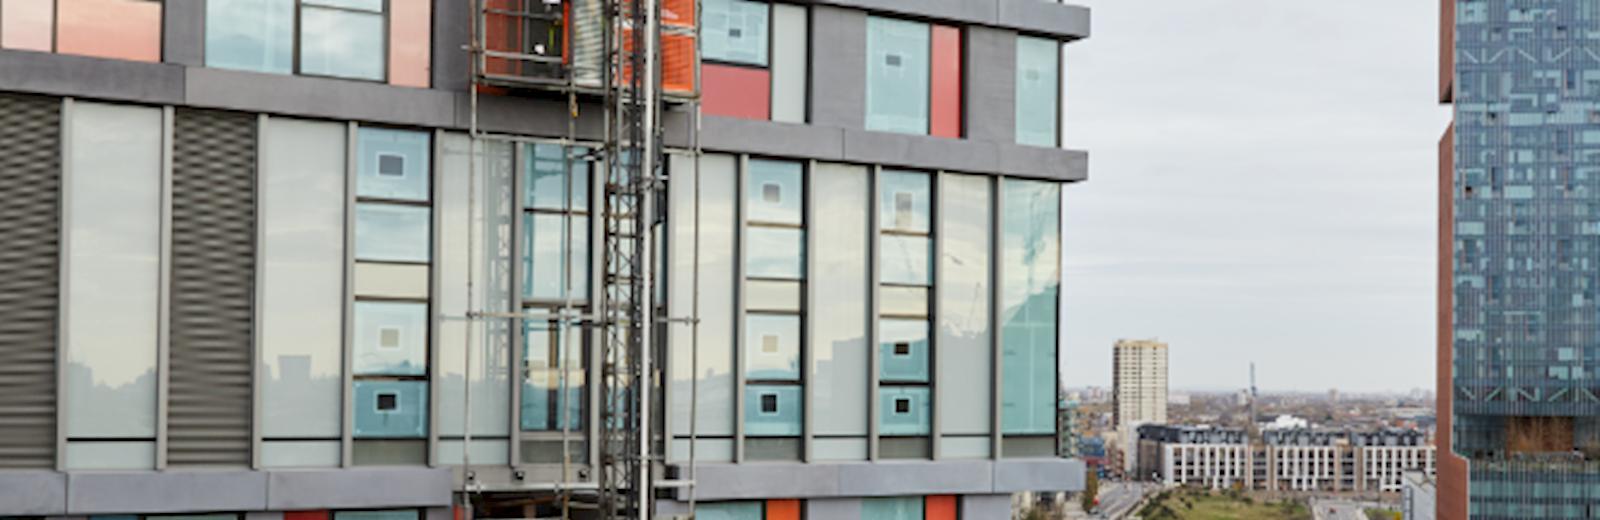 Colourful London flats - Mace